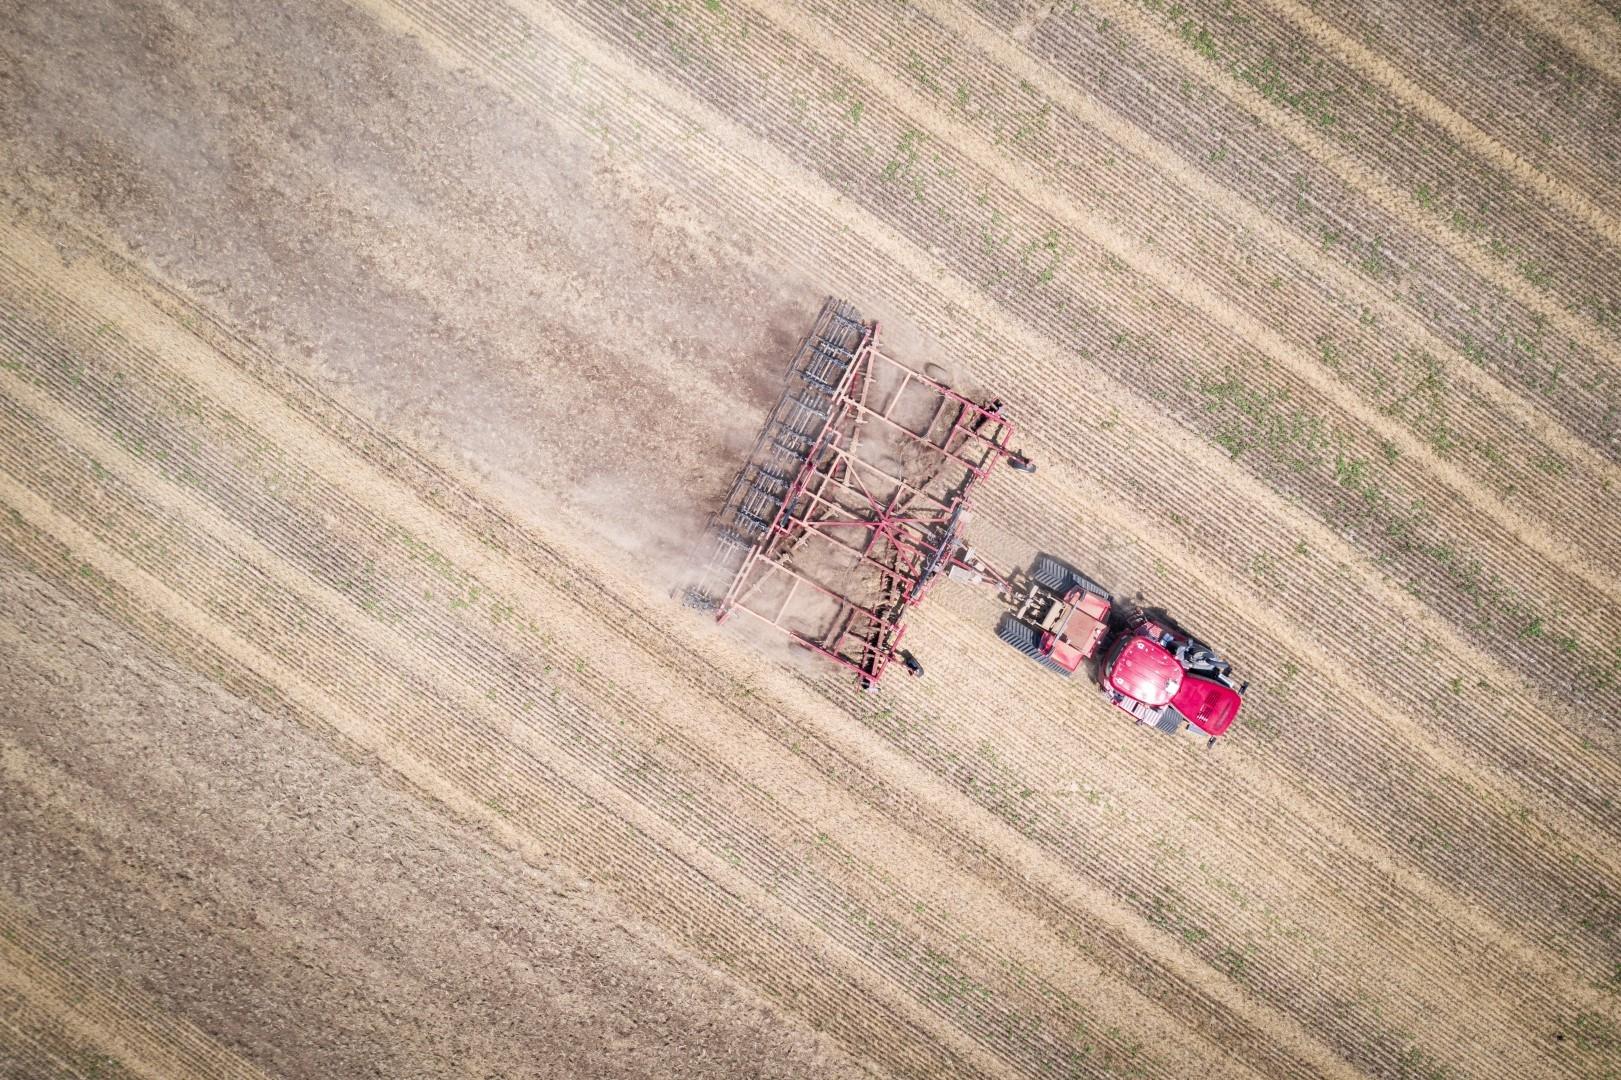 case-ih-tractor-quadtrac